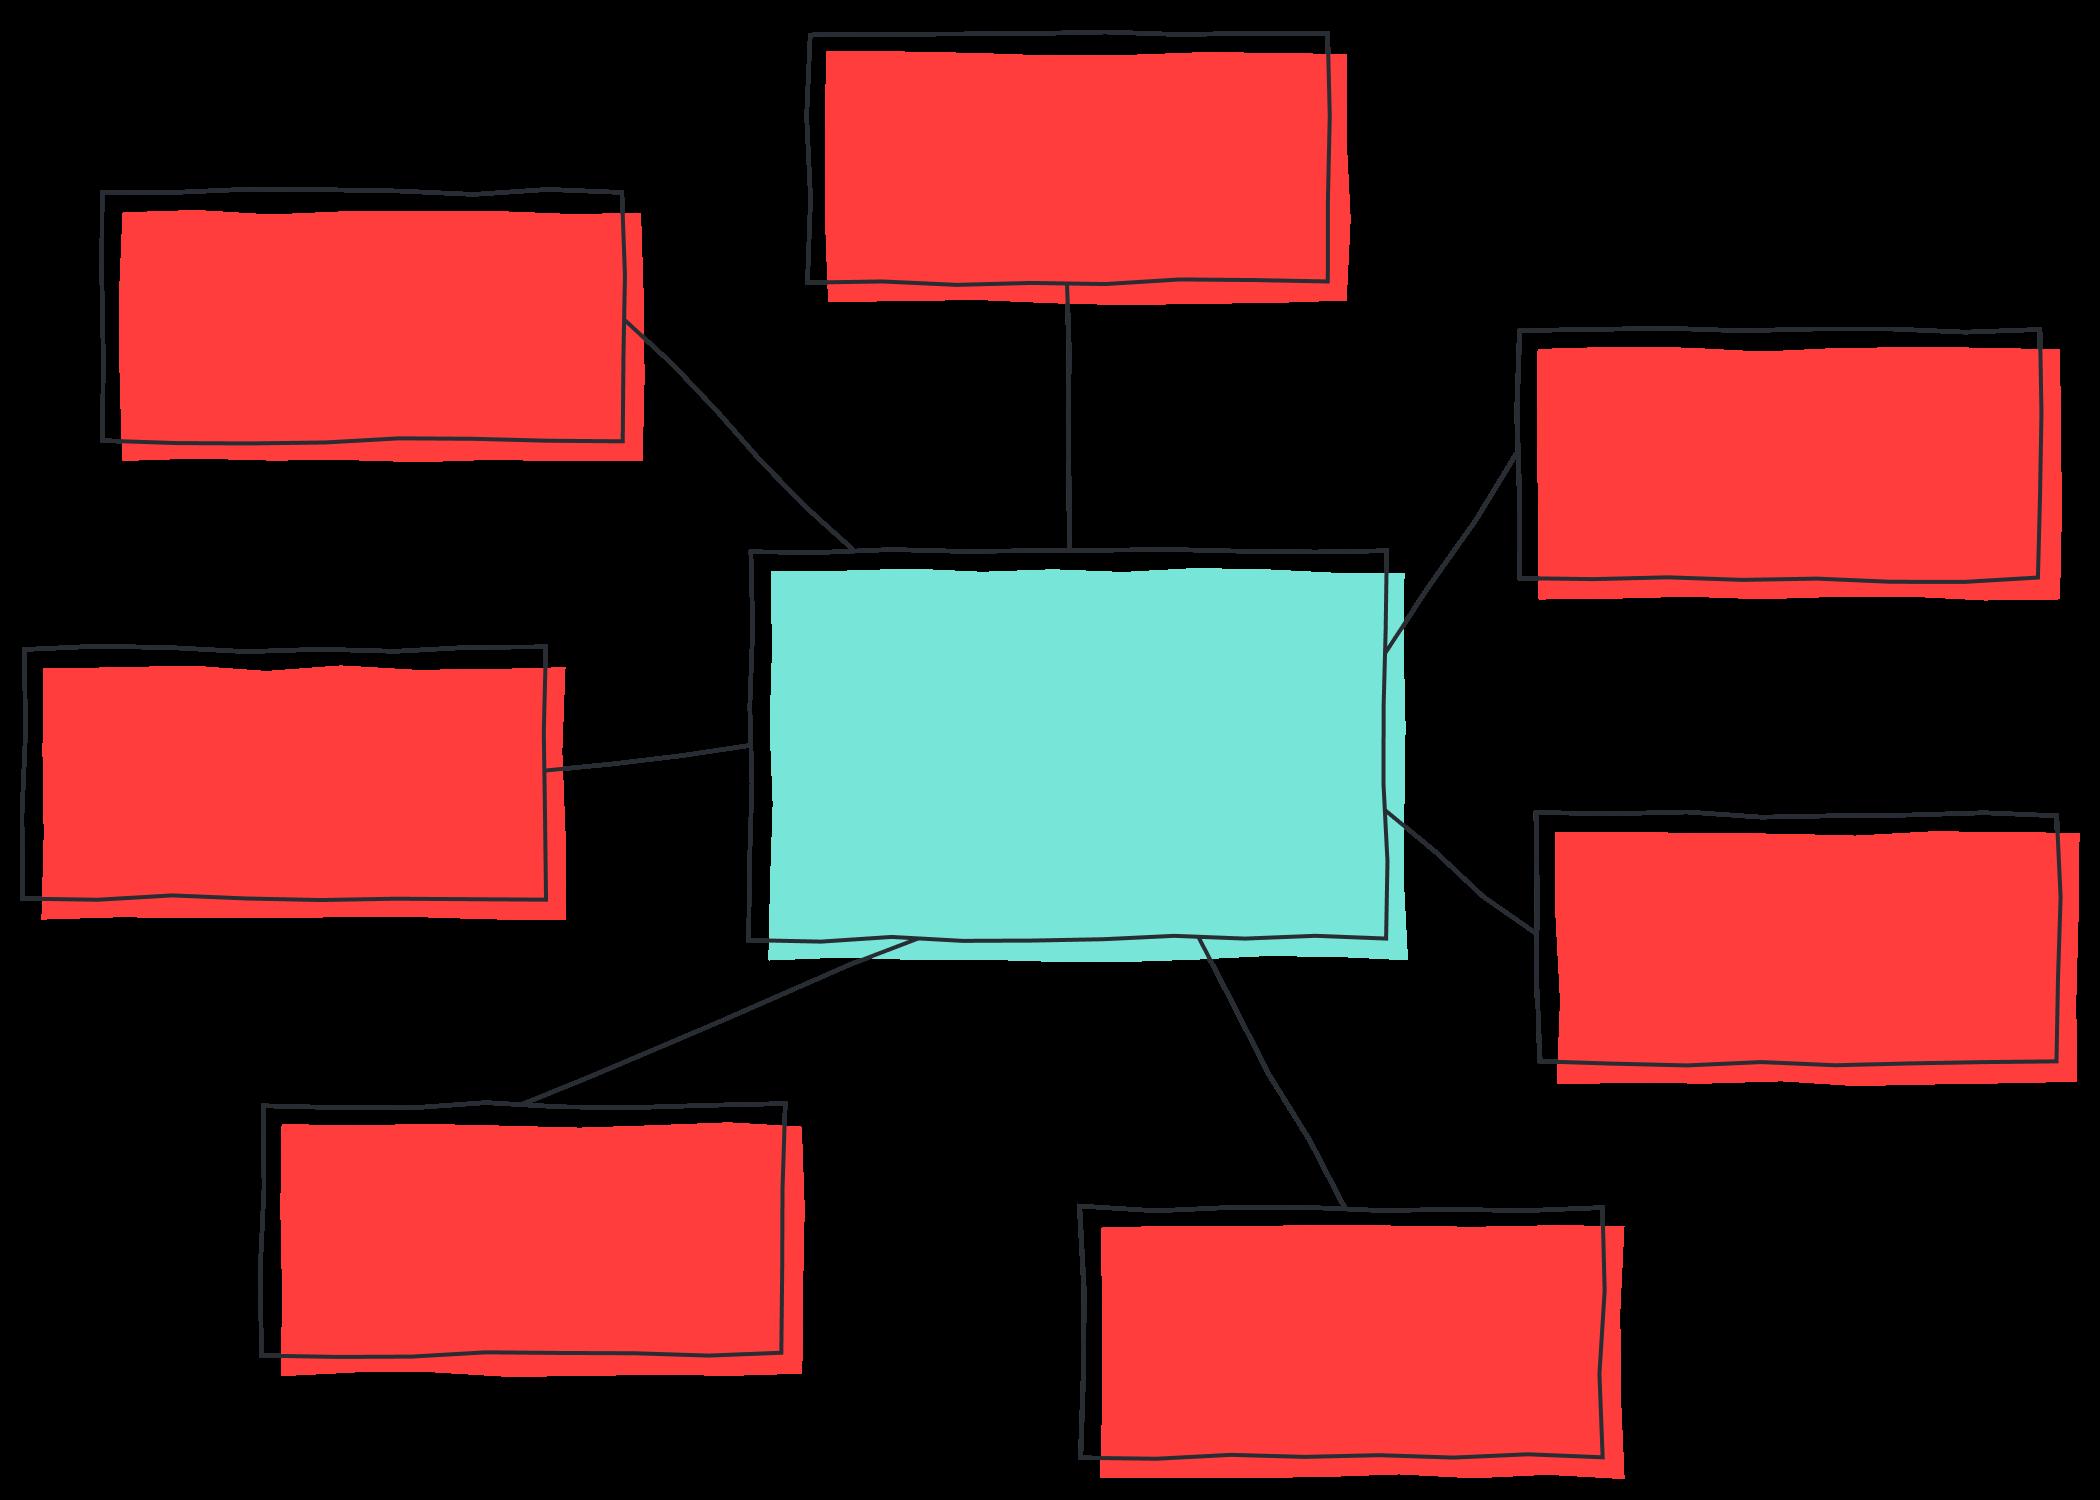 Programa de mapas mentais online